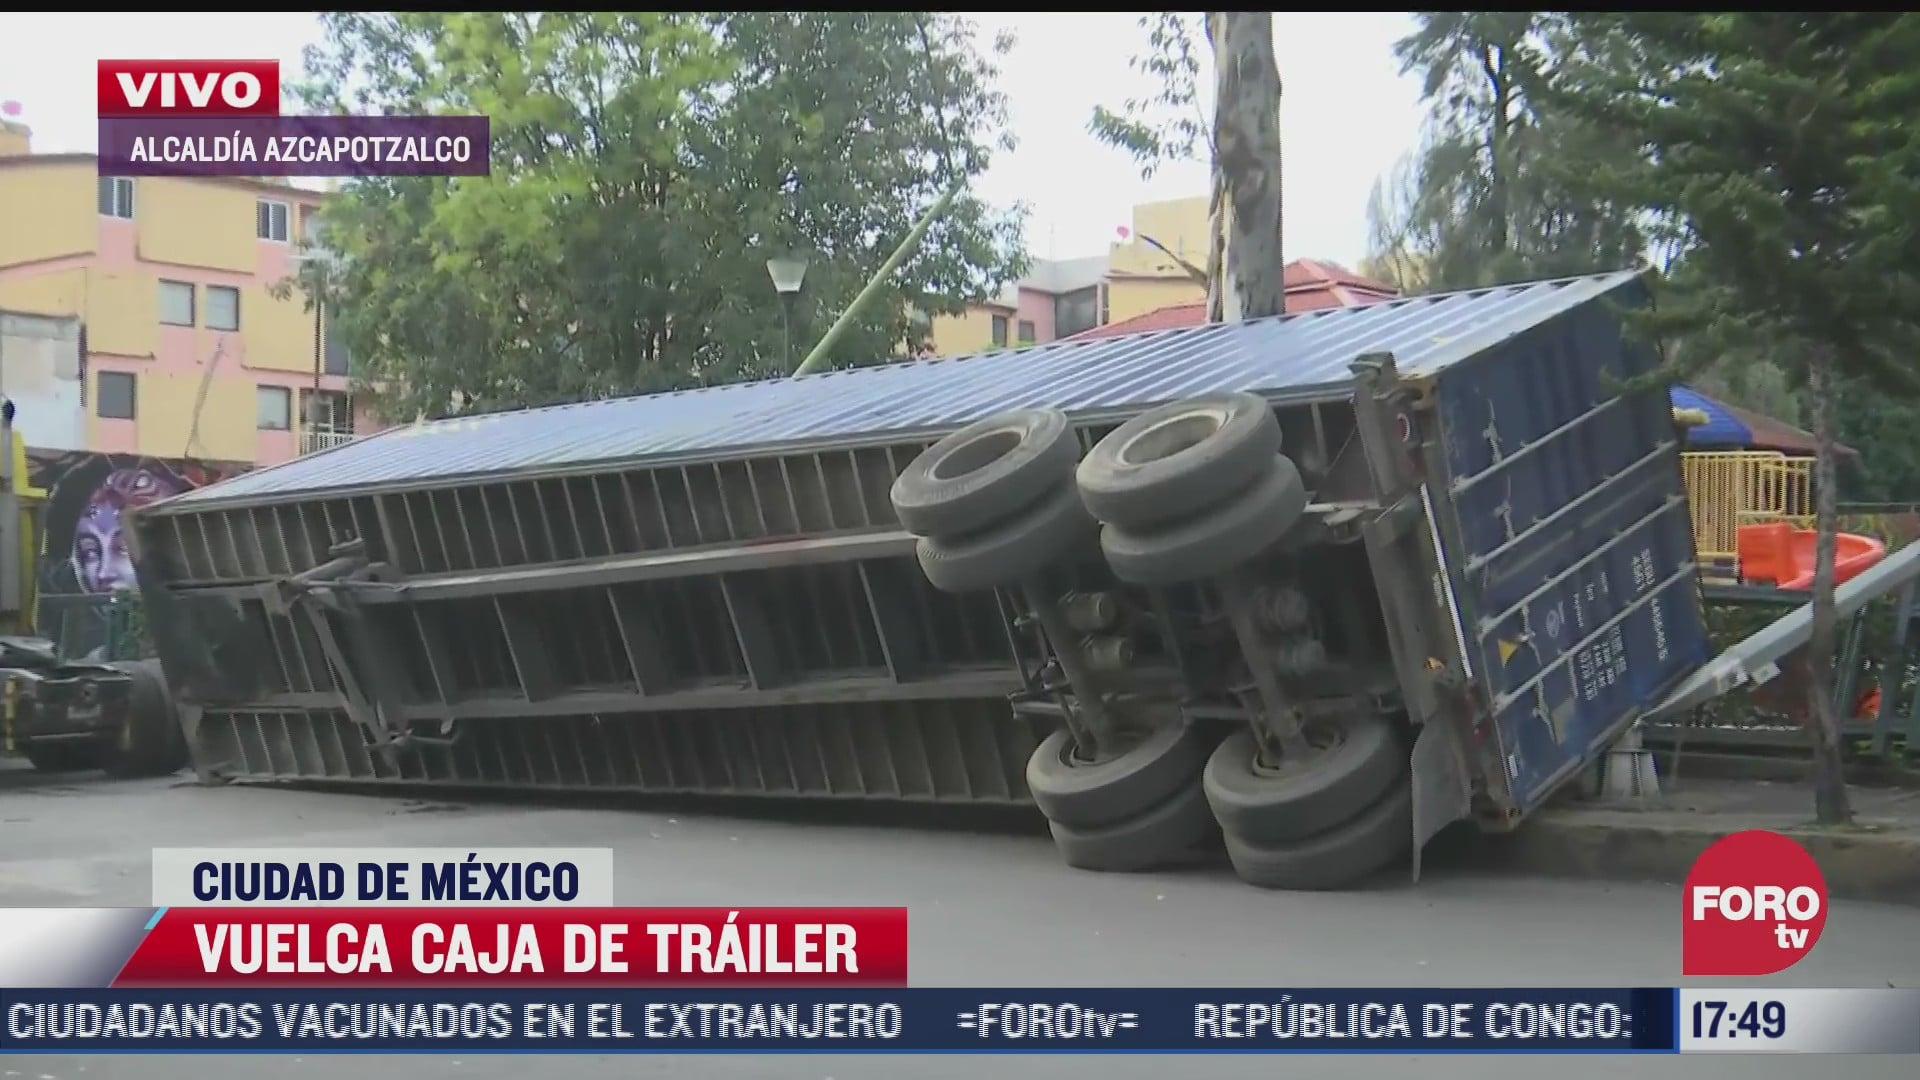 vuelca caja de trailer en la alcaldia azcapotzalco